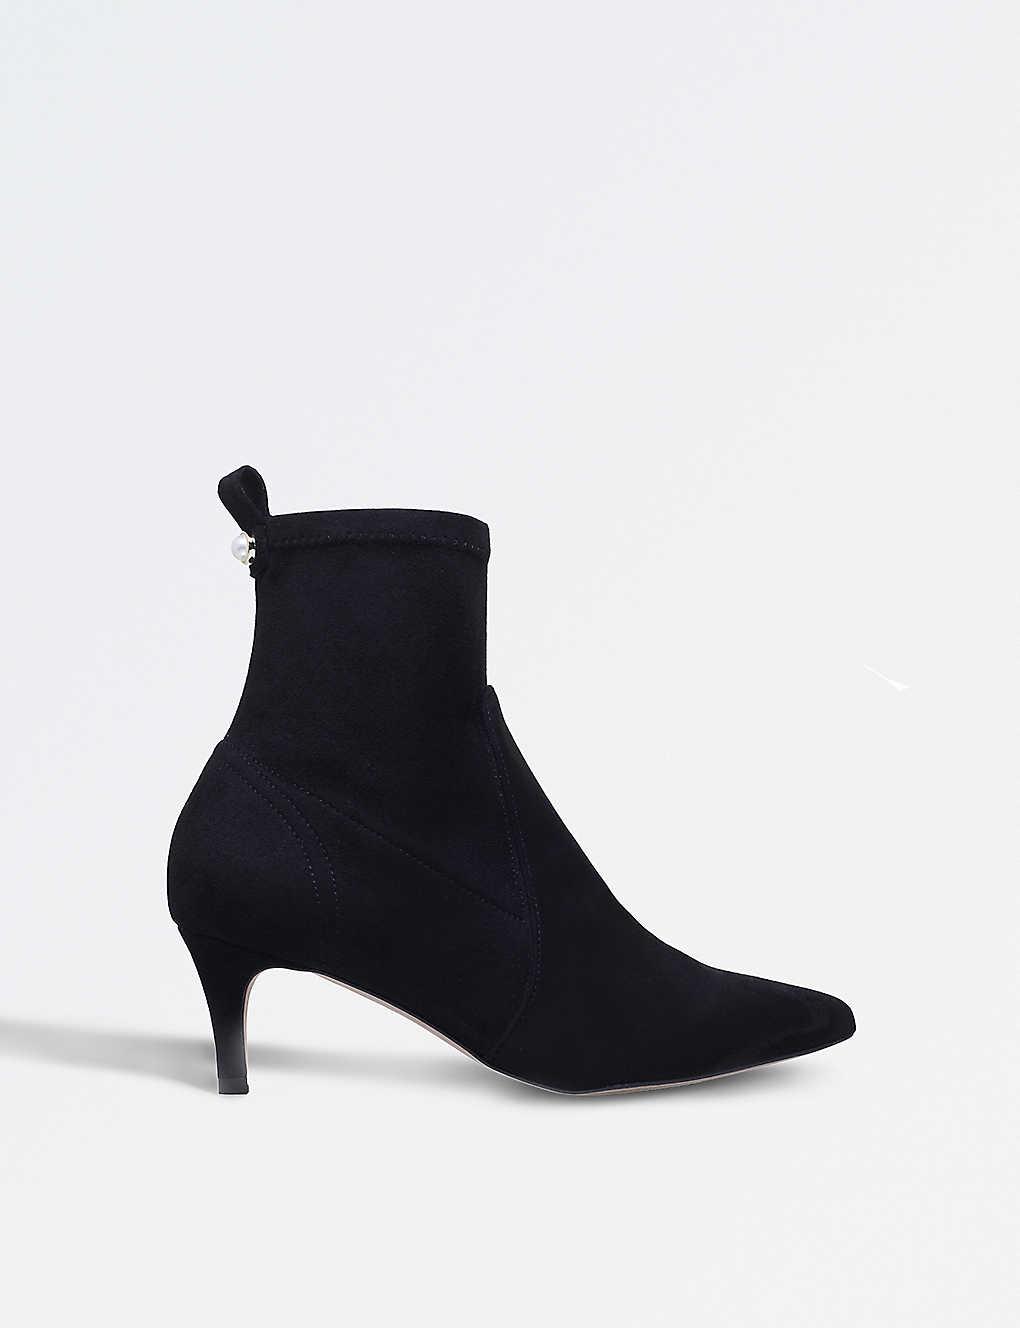 8b5112f3831 CARVELA - Scilly suedette ankle boots | Selfridges.com